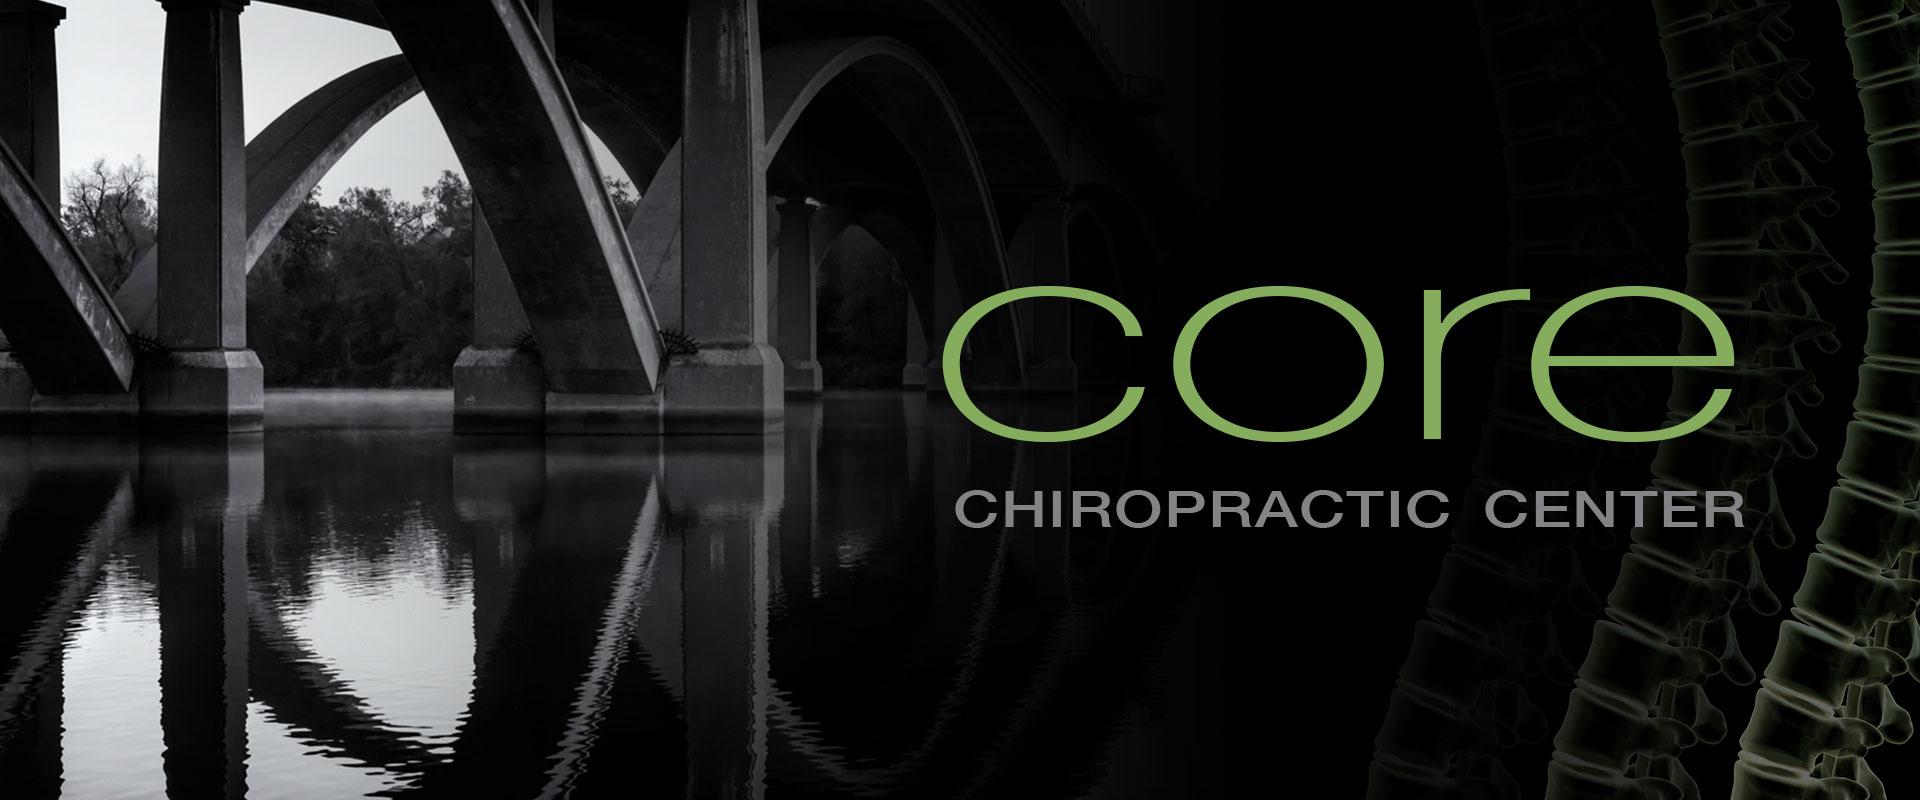 Core-Chiropractic-Slider-01